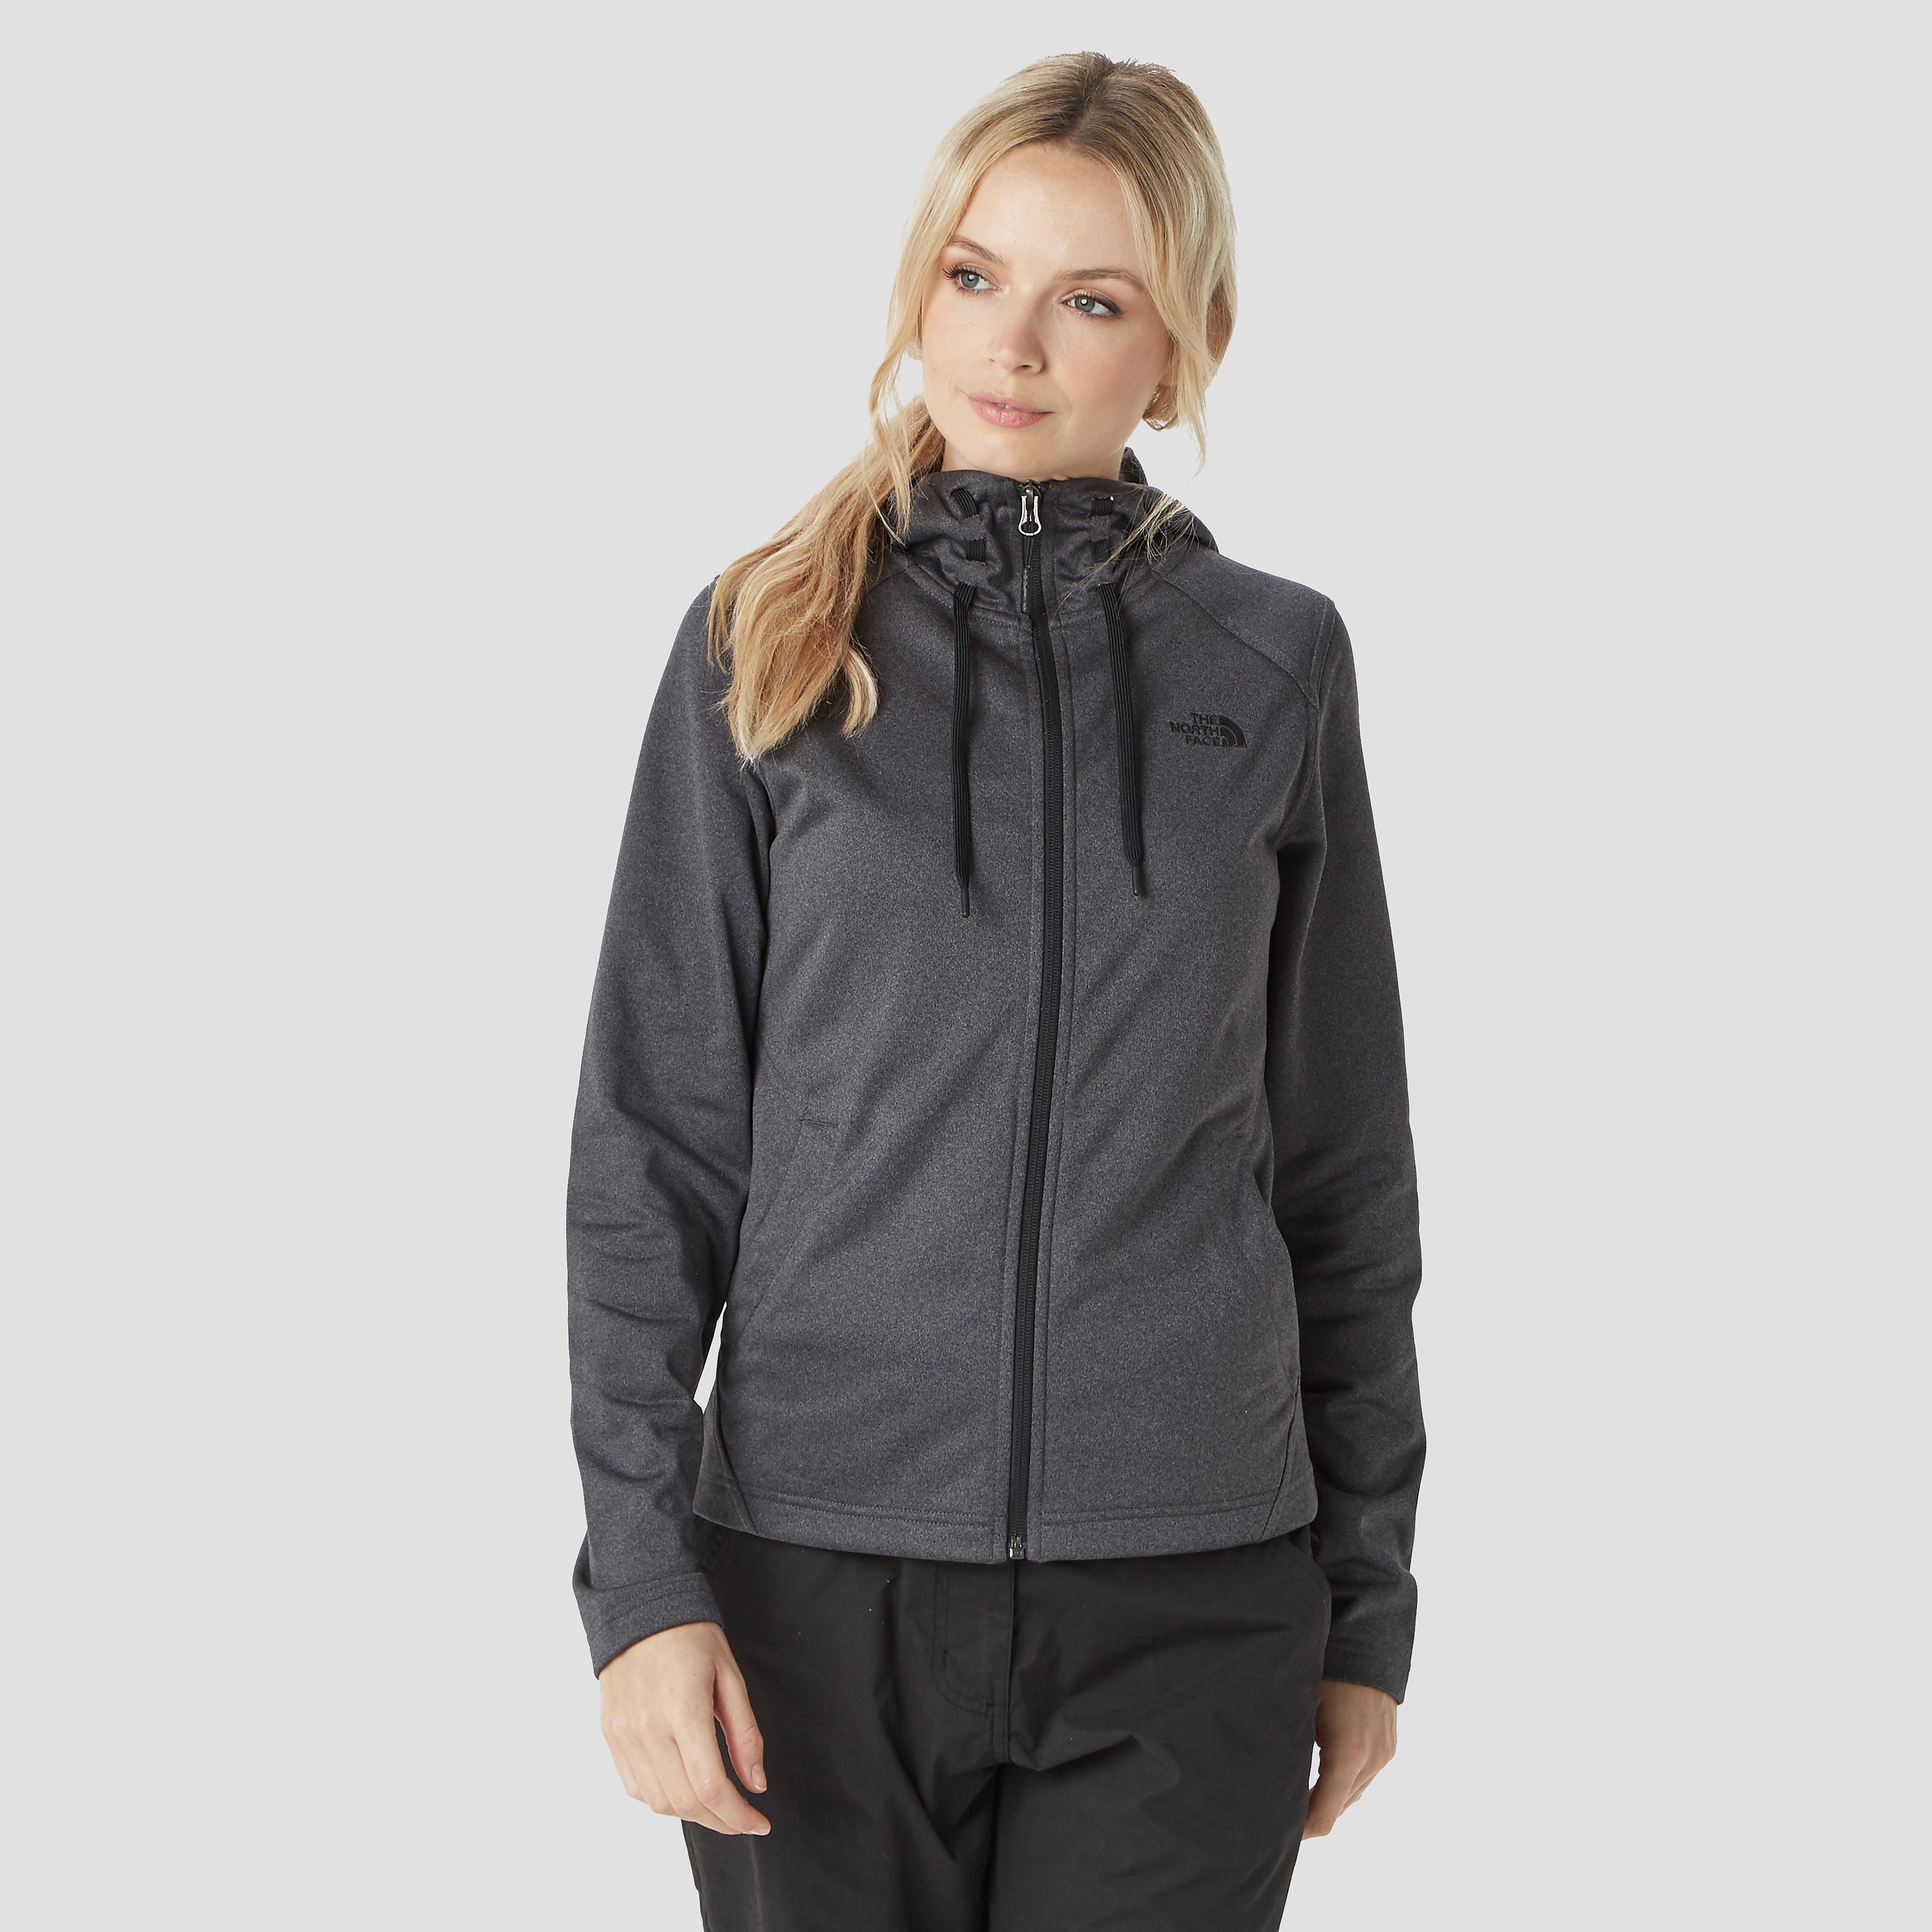 The North Face Women's Mezzaluna Tech Fleece